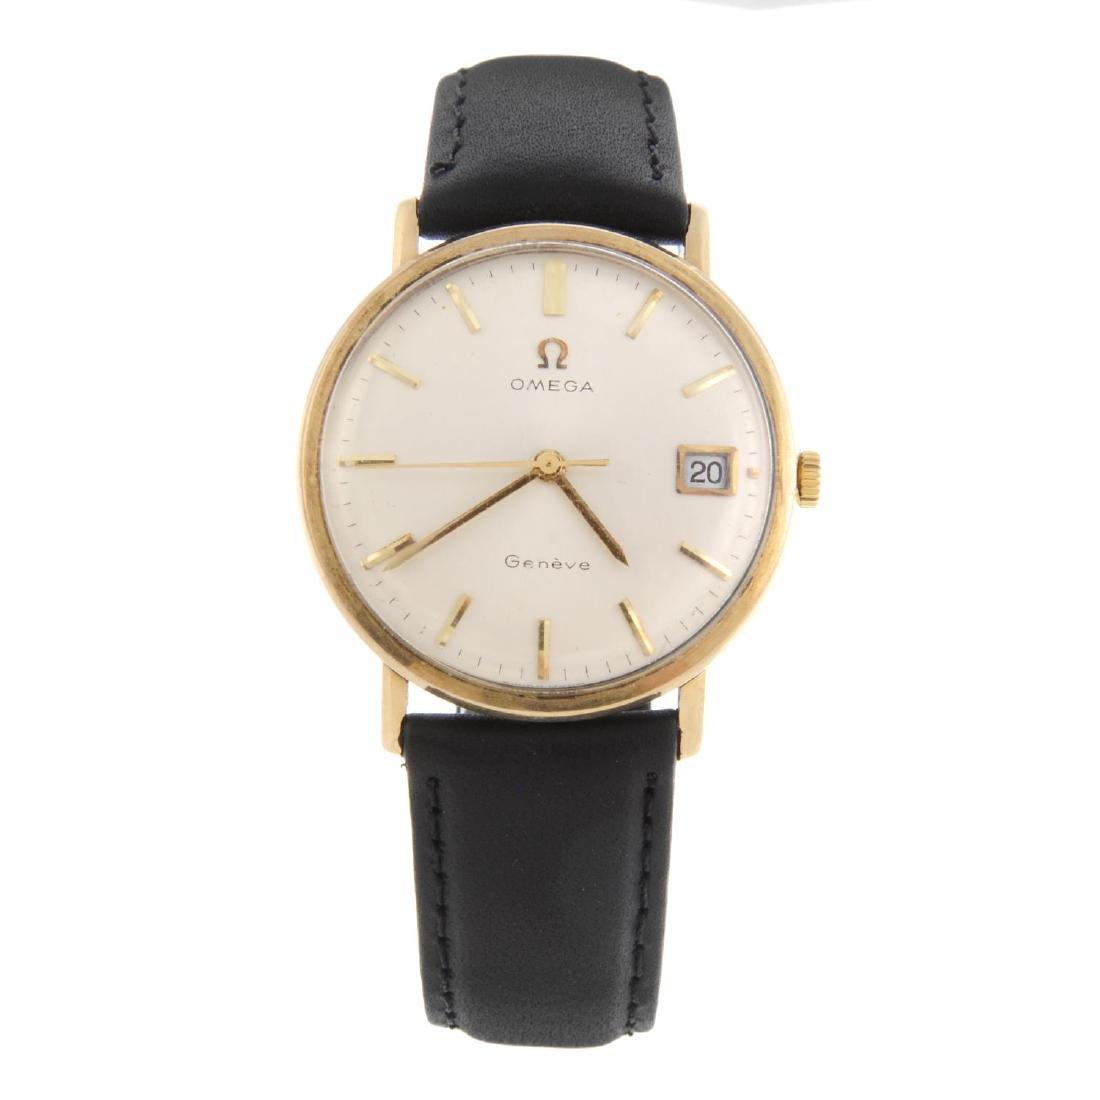 OMEGA - a gentleman's Genève wrist watch. 9ct yellow